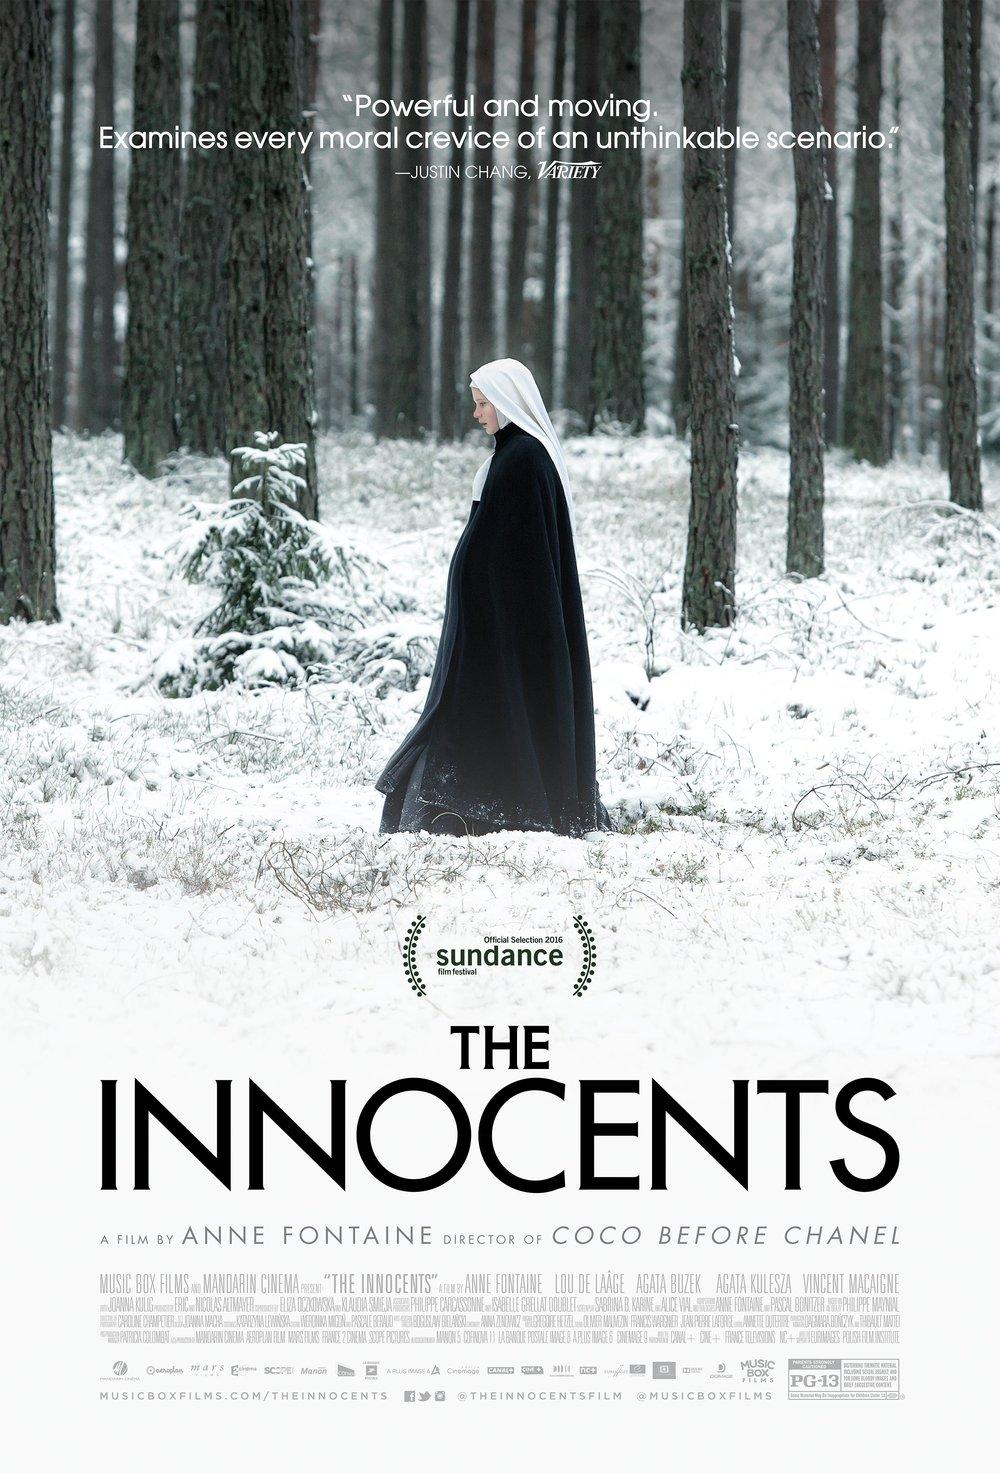 TheInnocents_Poster.jpg